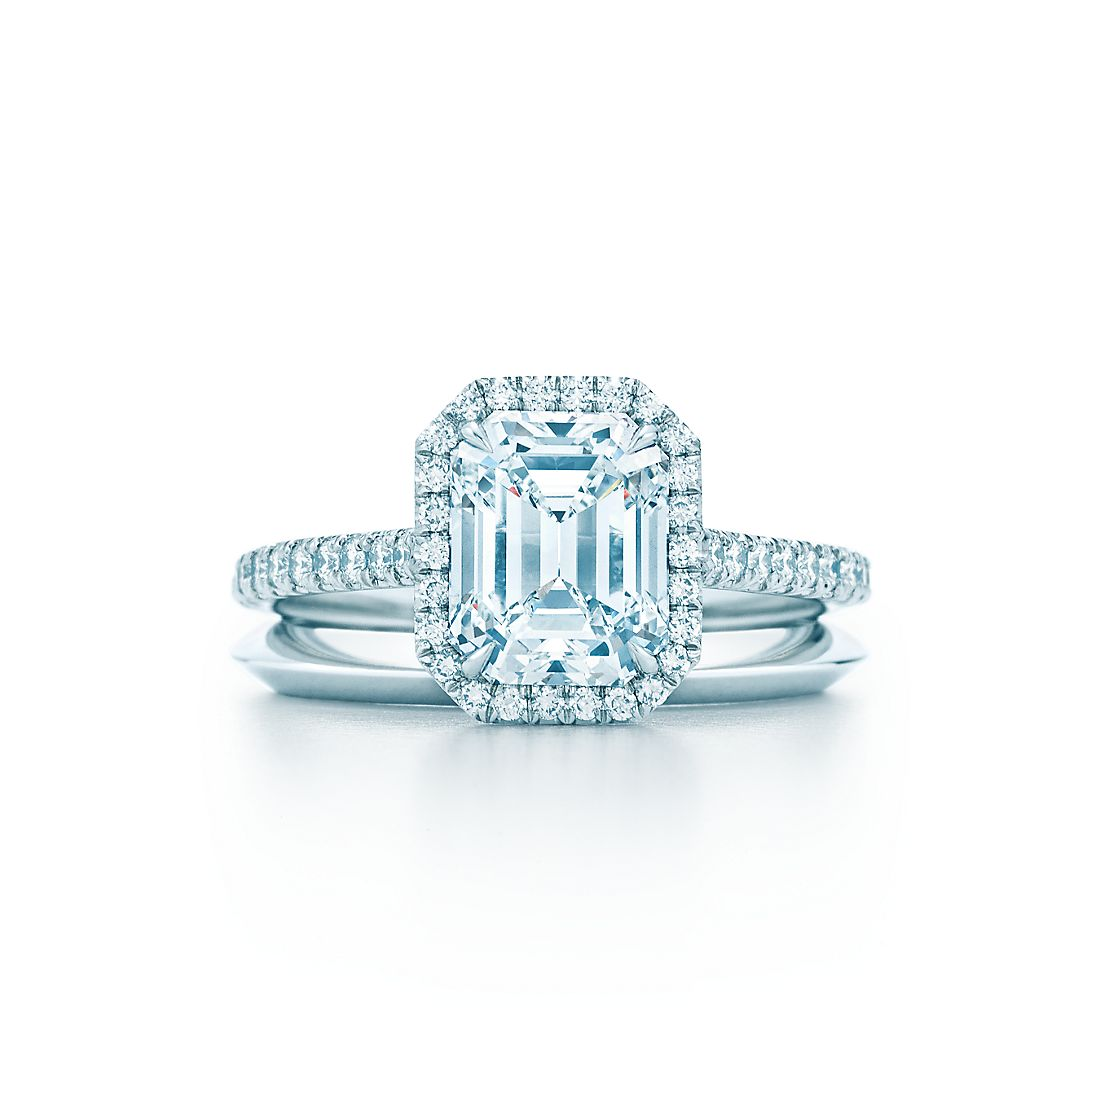 Engagement ring tiffany  Emerald Cut Diamond Engagement Rings | Tiffany Soleste® Engagement ...